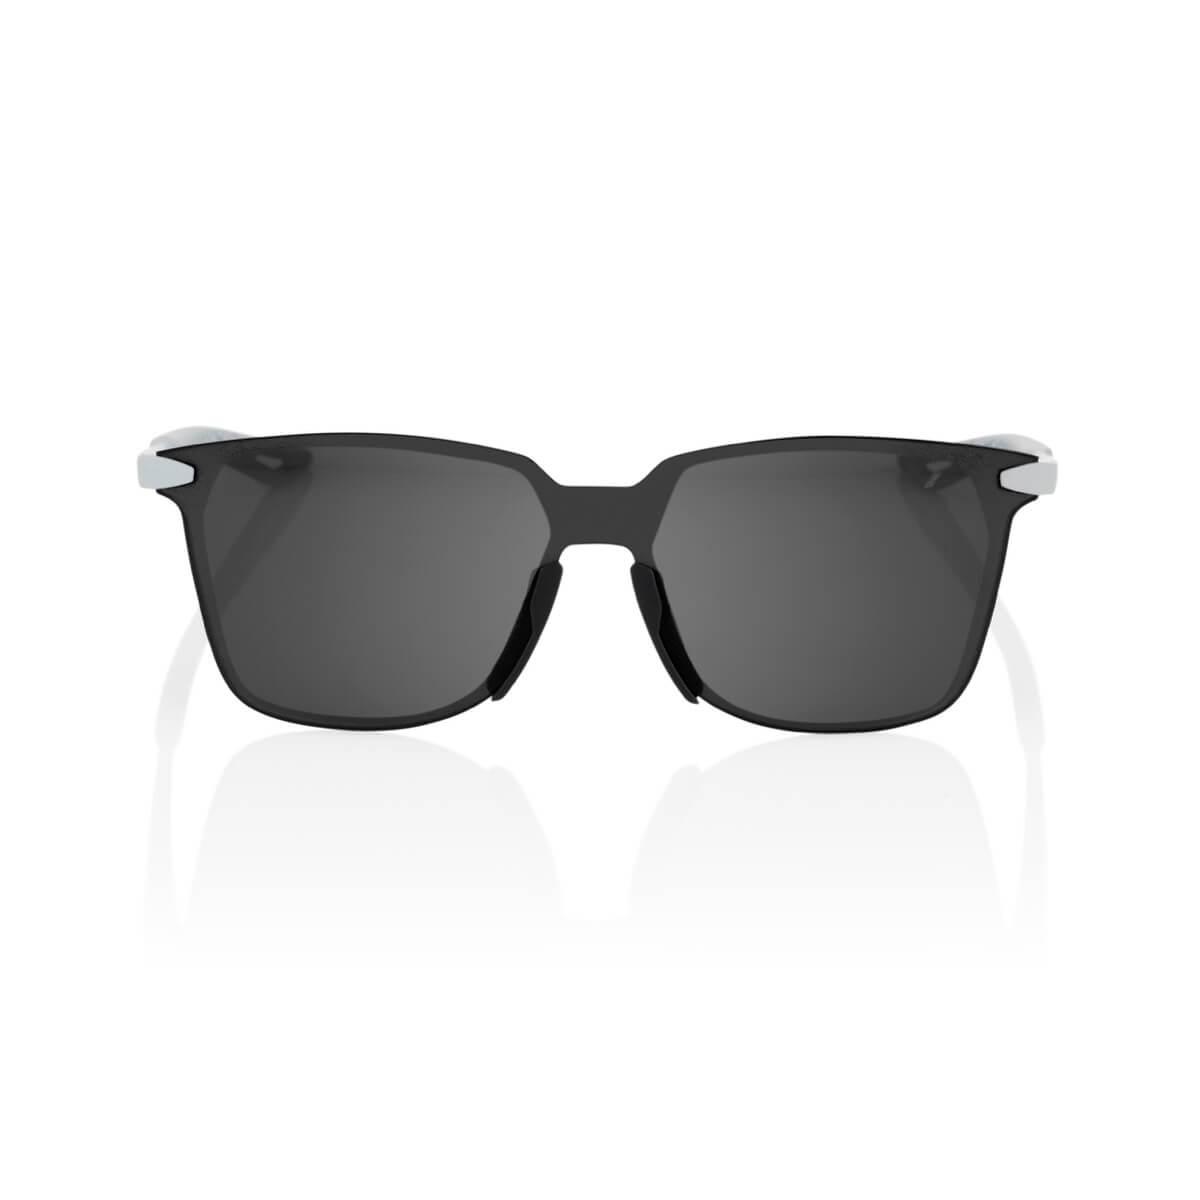 LEGERE Square – Soft Tact Stone Grey – Black Mirror Lens